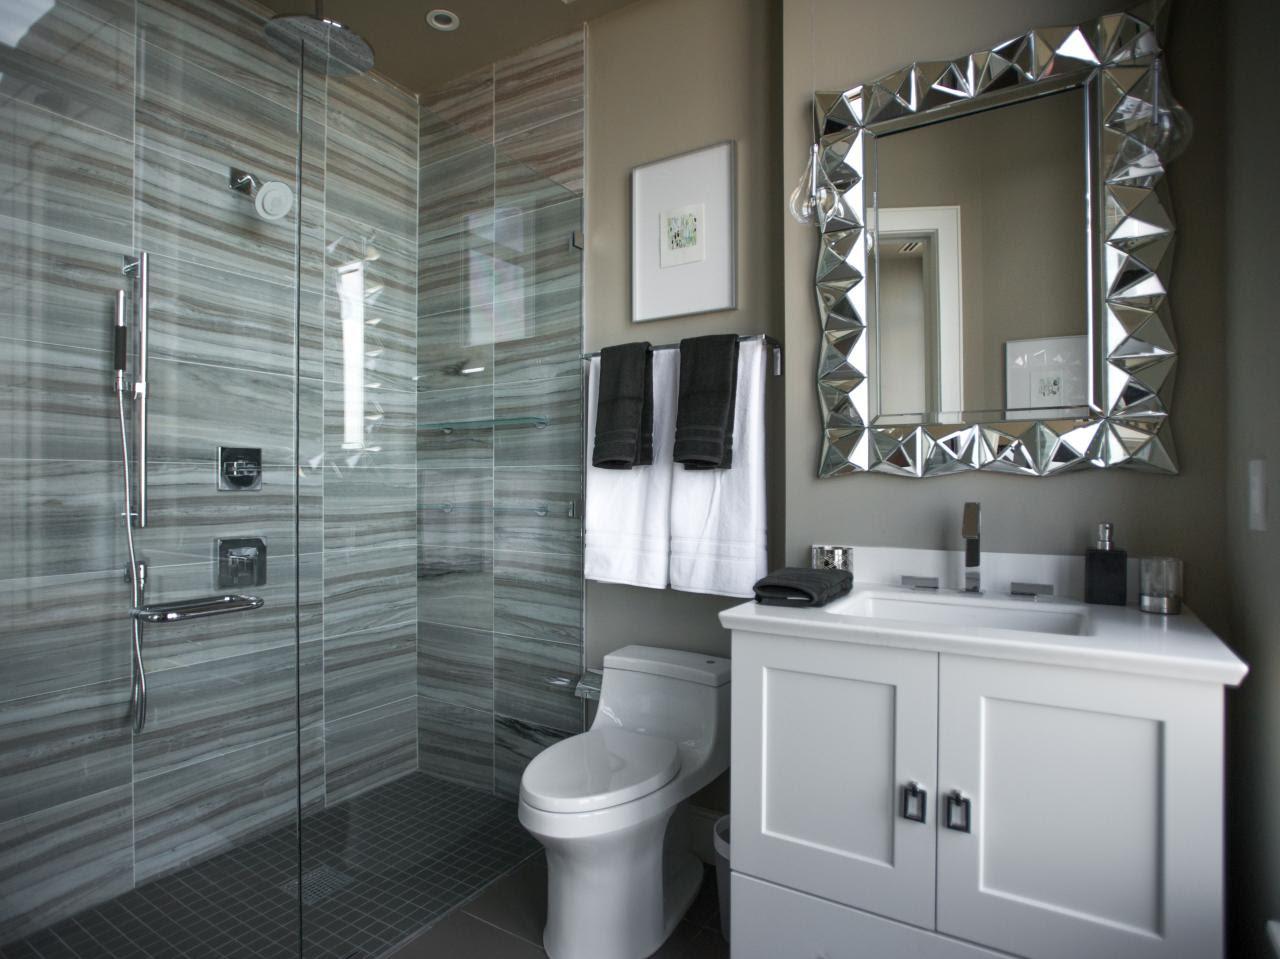 Guest Bathroom From HGTV Urban Oasis 2014 | HGTV Urban ...